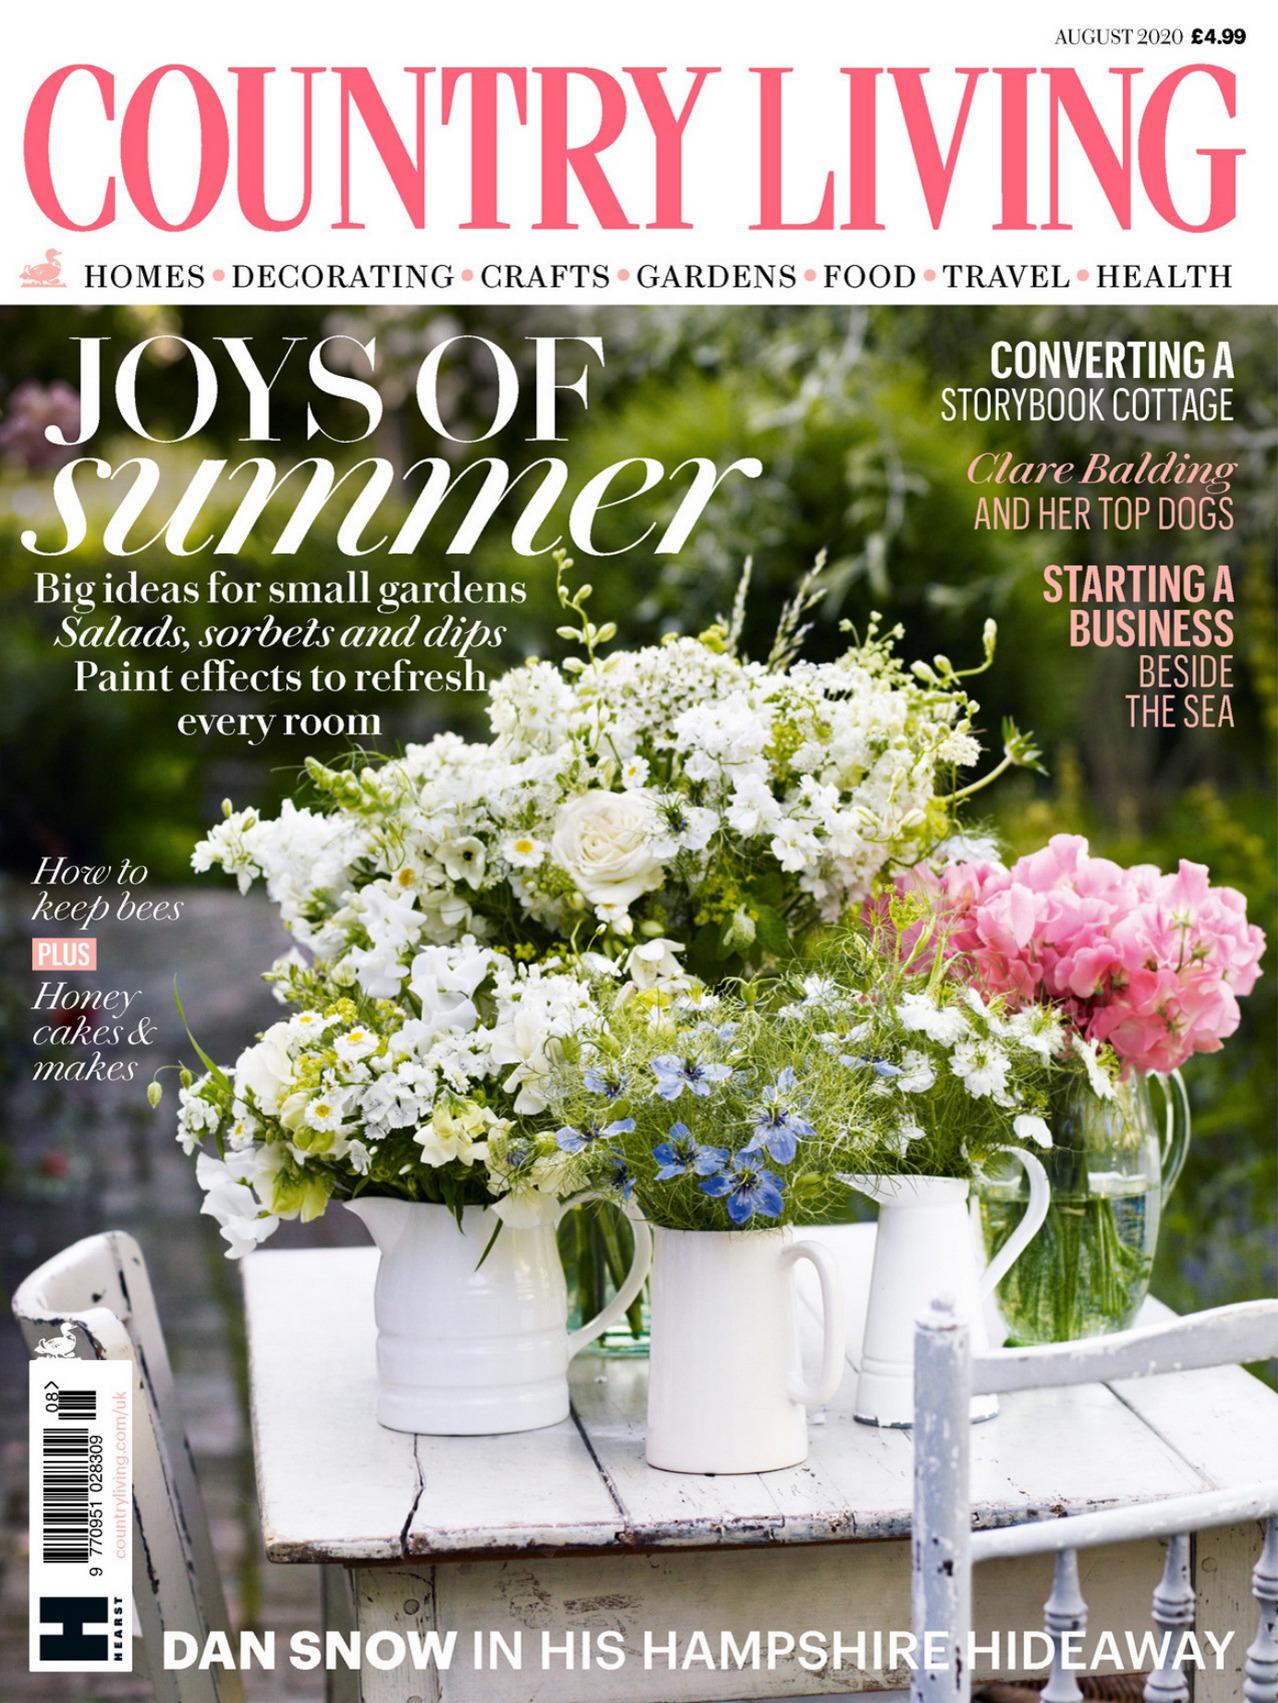 《Country Living》英国版时尚家居杂志2020年08月号